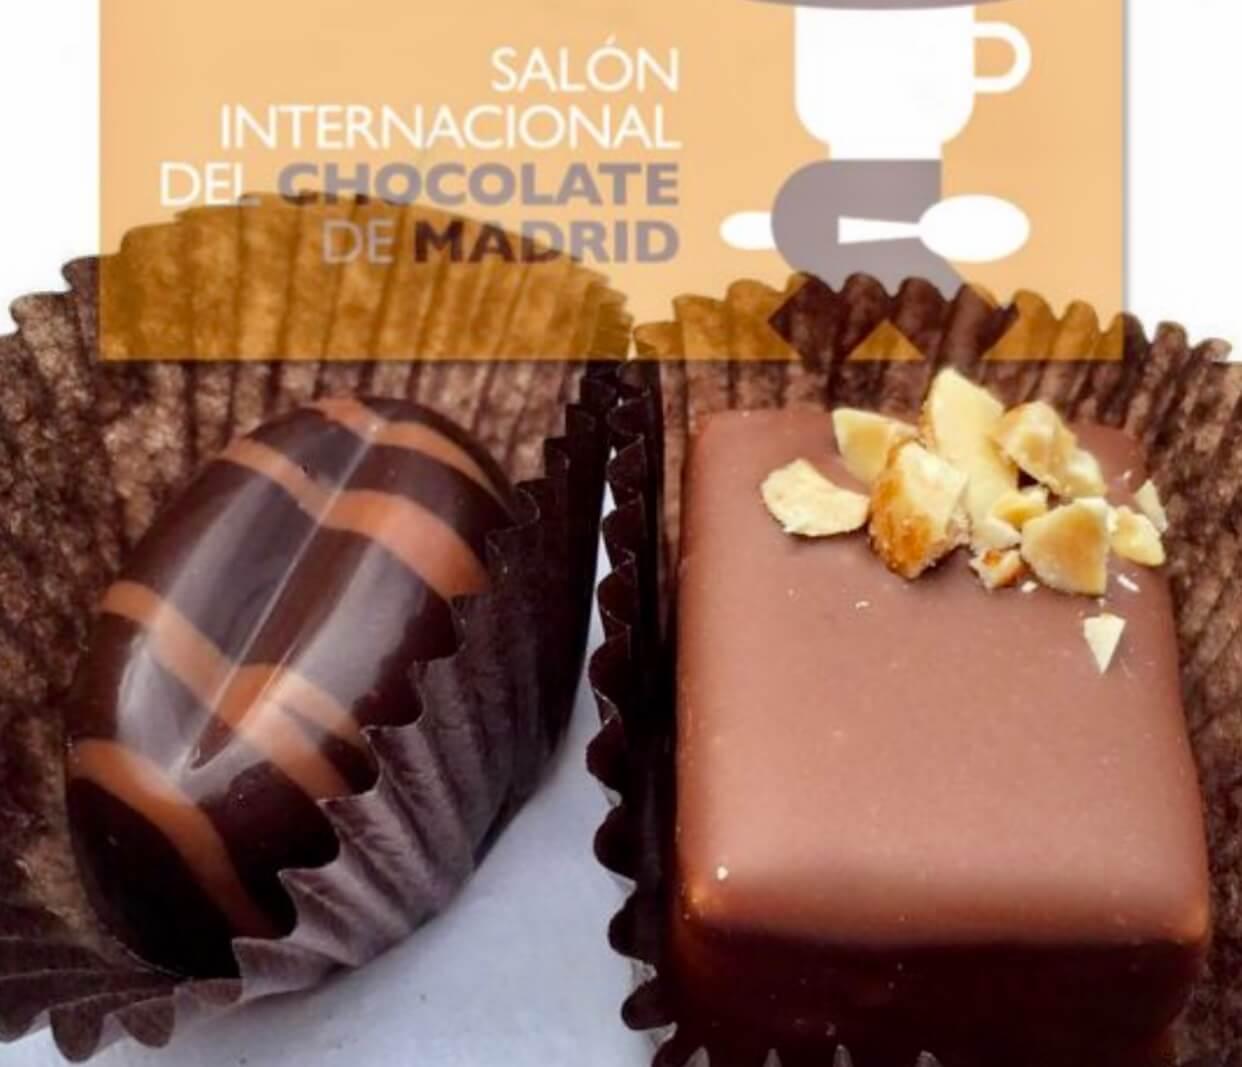 II Salón Internacional del Chocolate